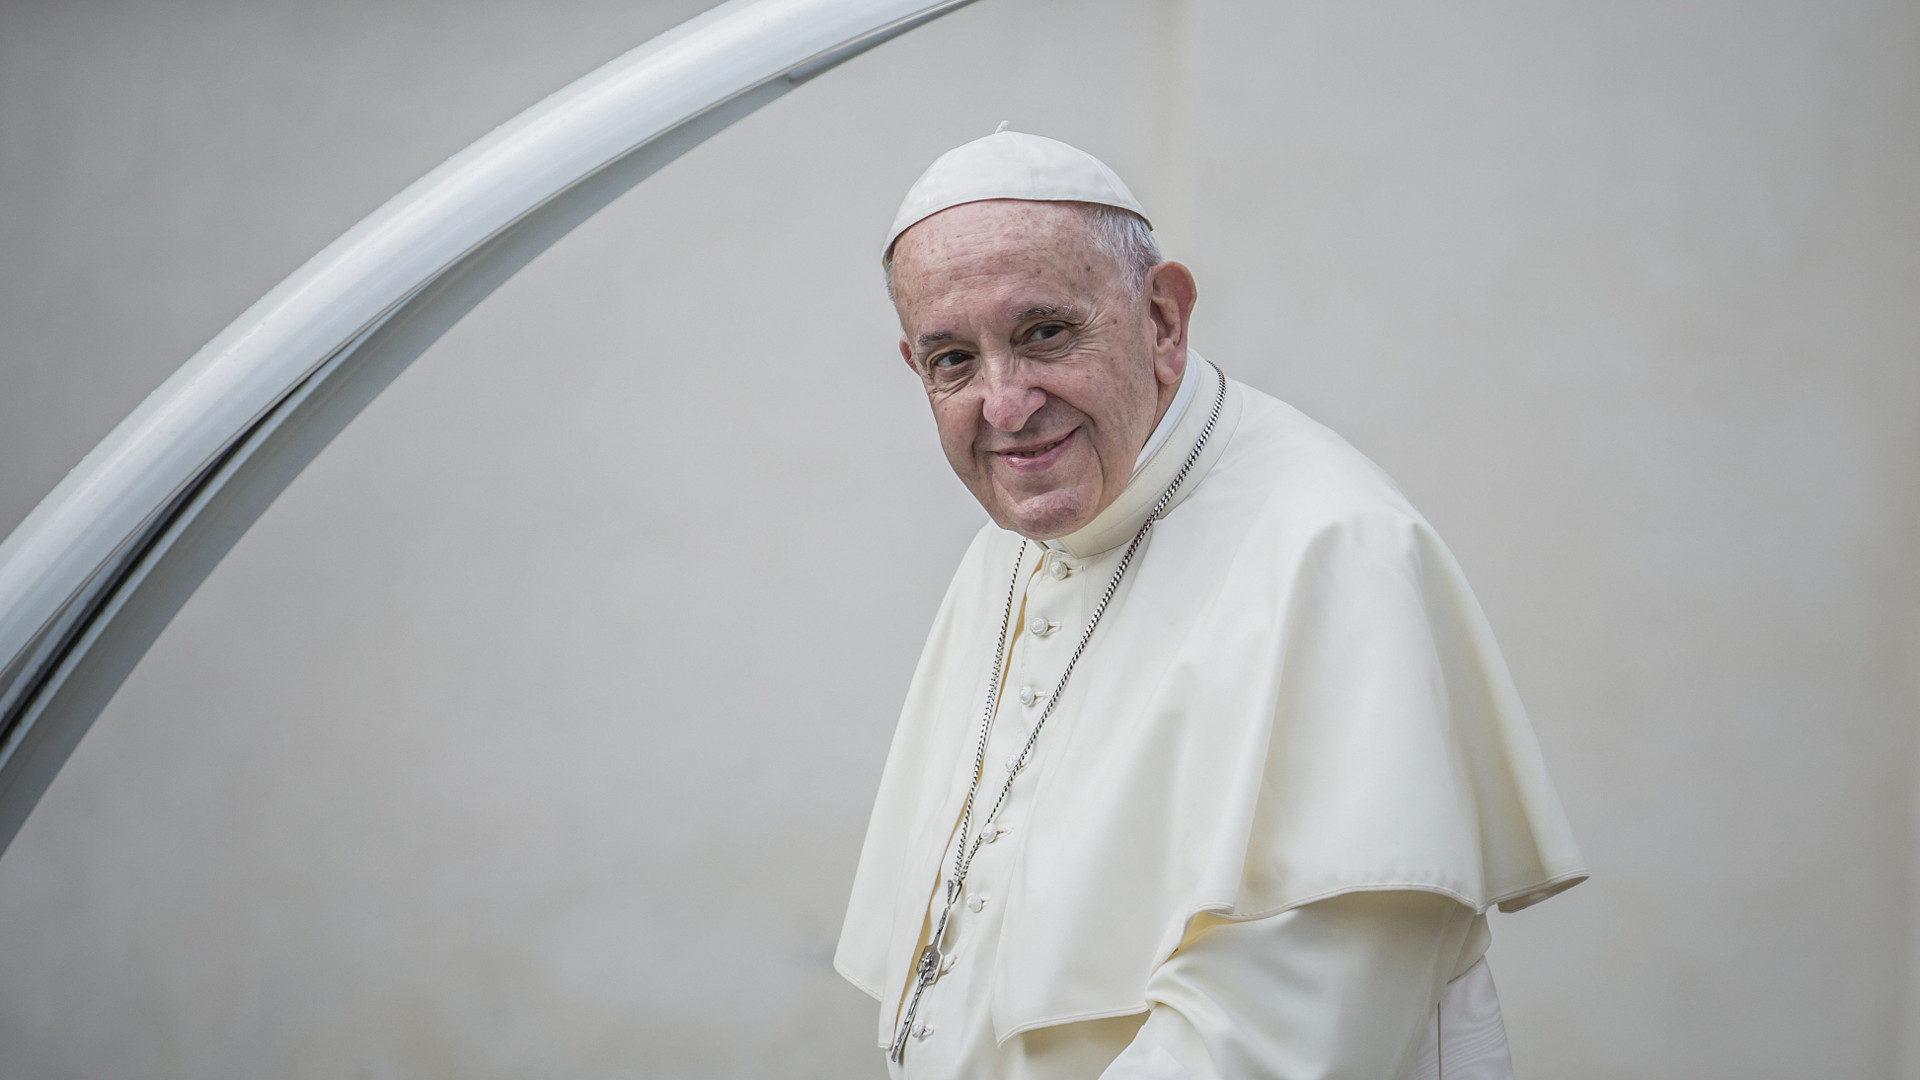 Papst Franziskus im Papamobil | © kna